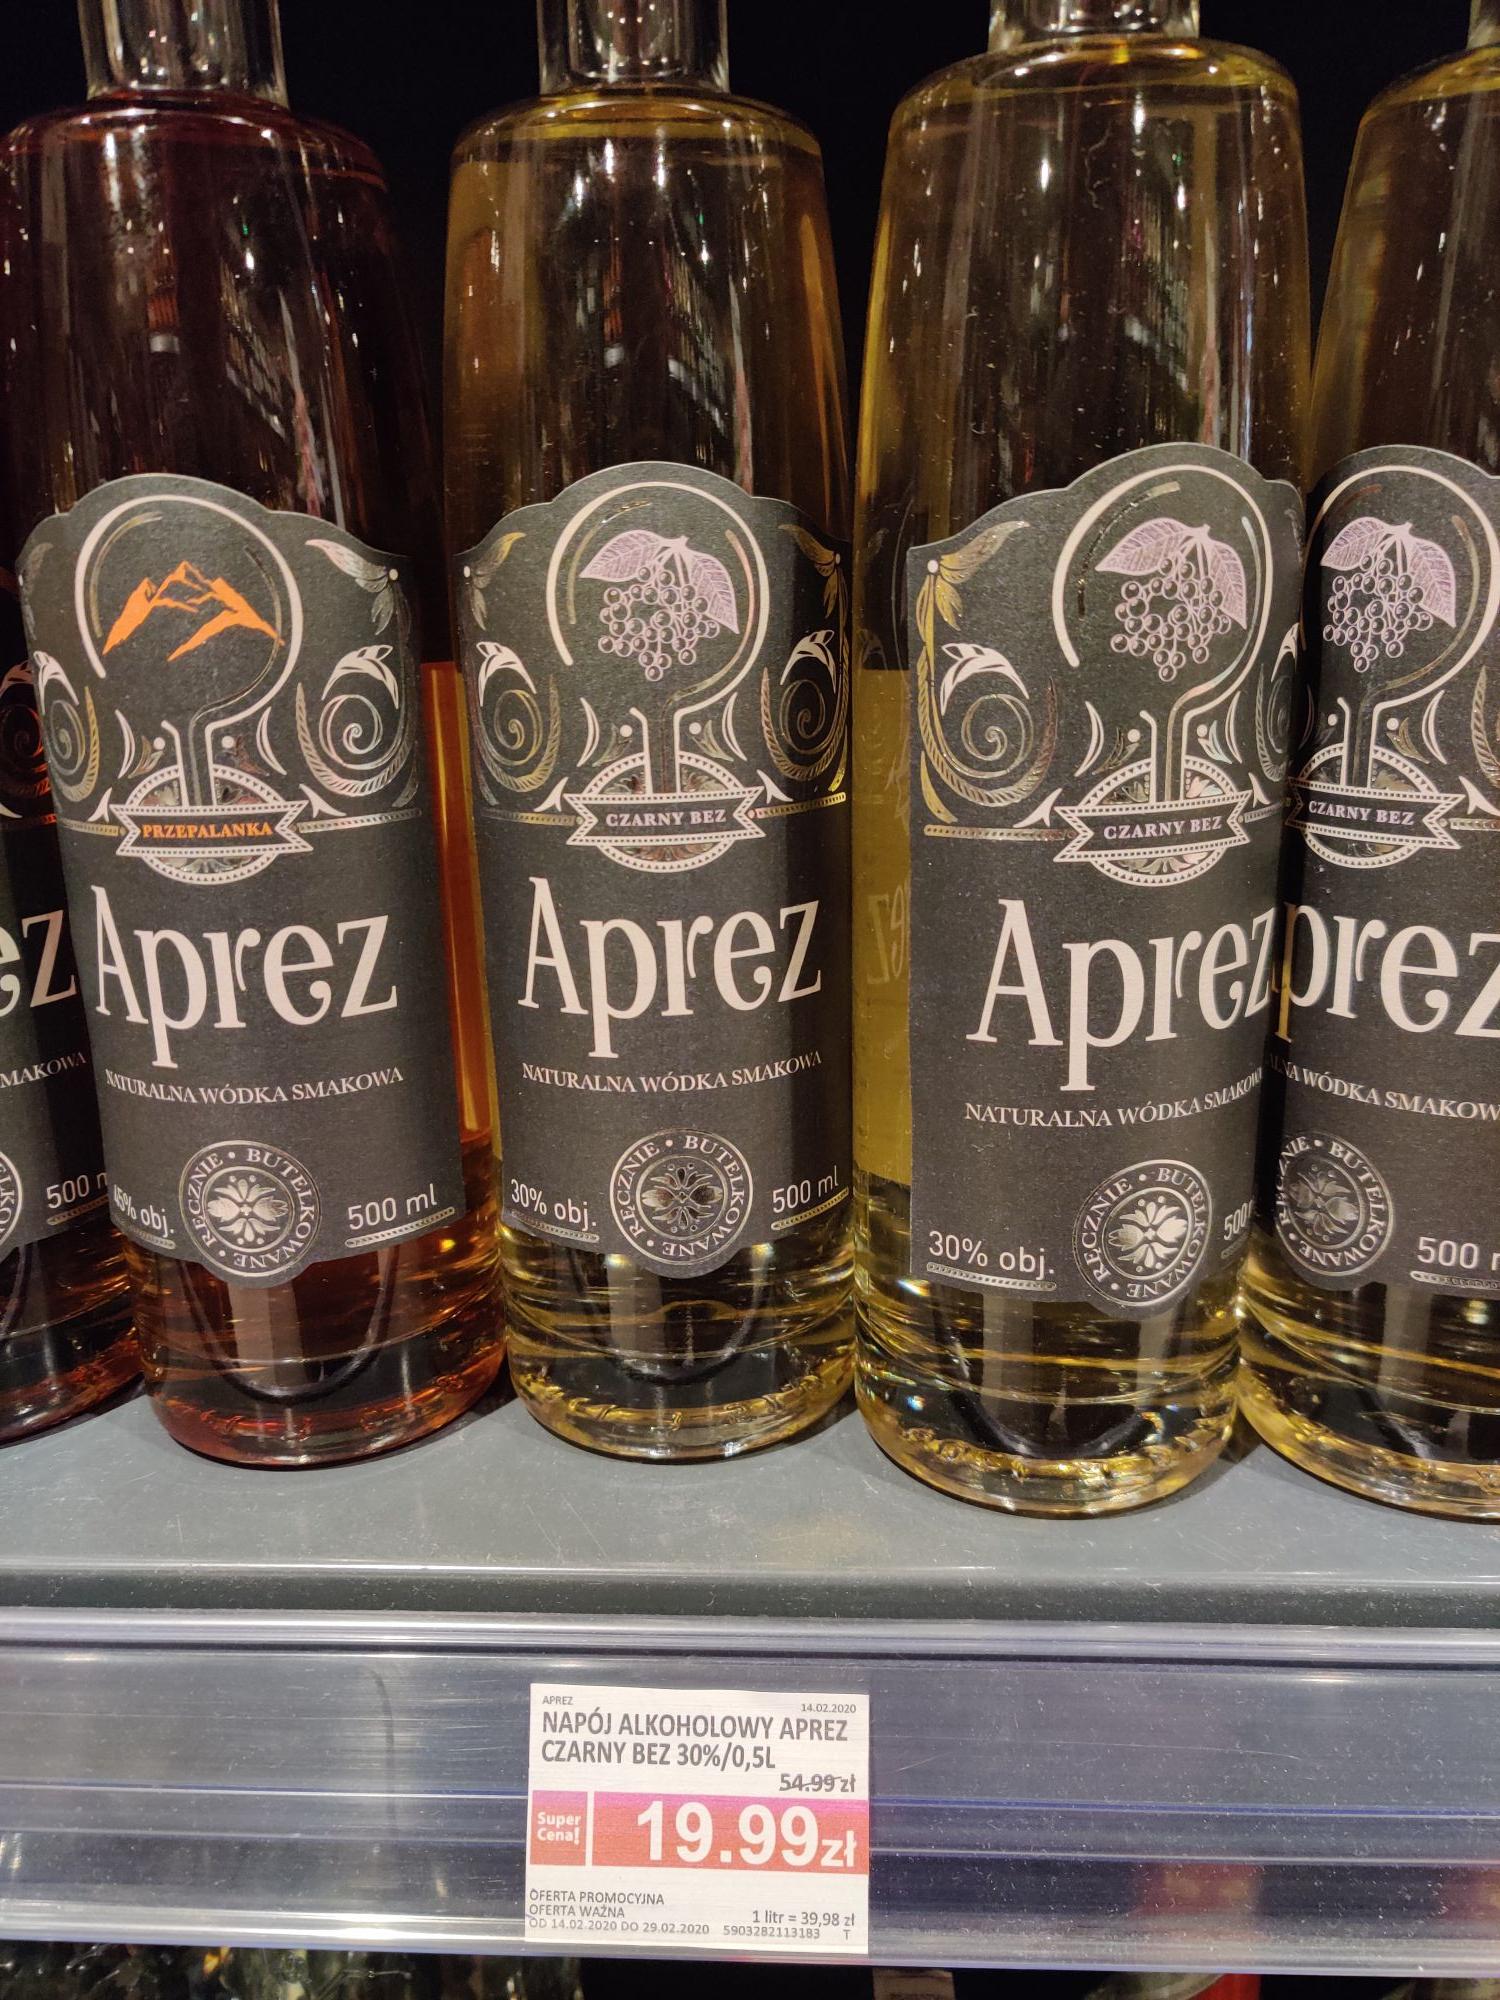 Aprez - Naturalna wódka smakowa